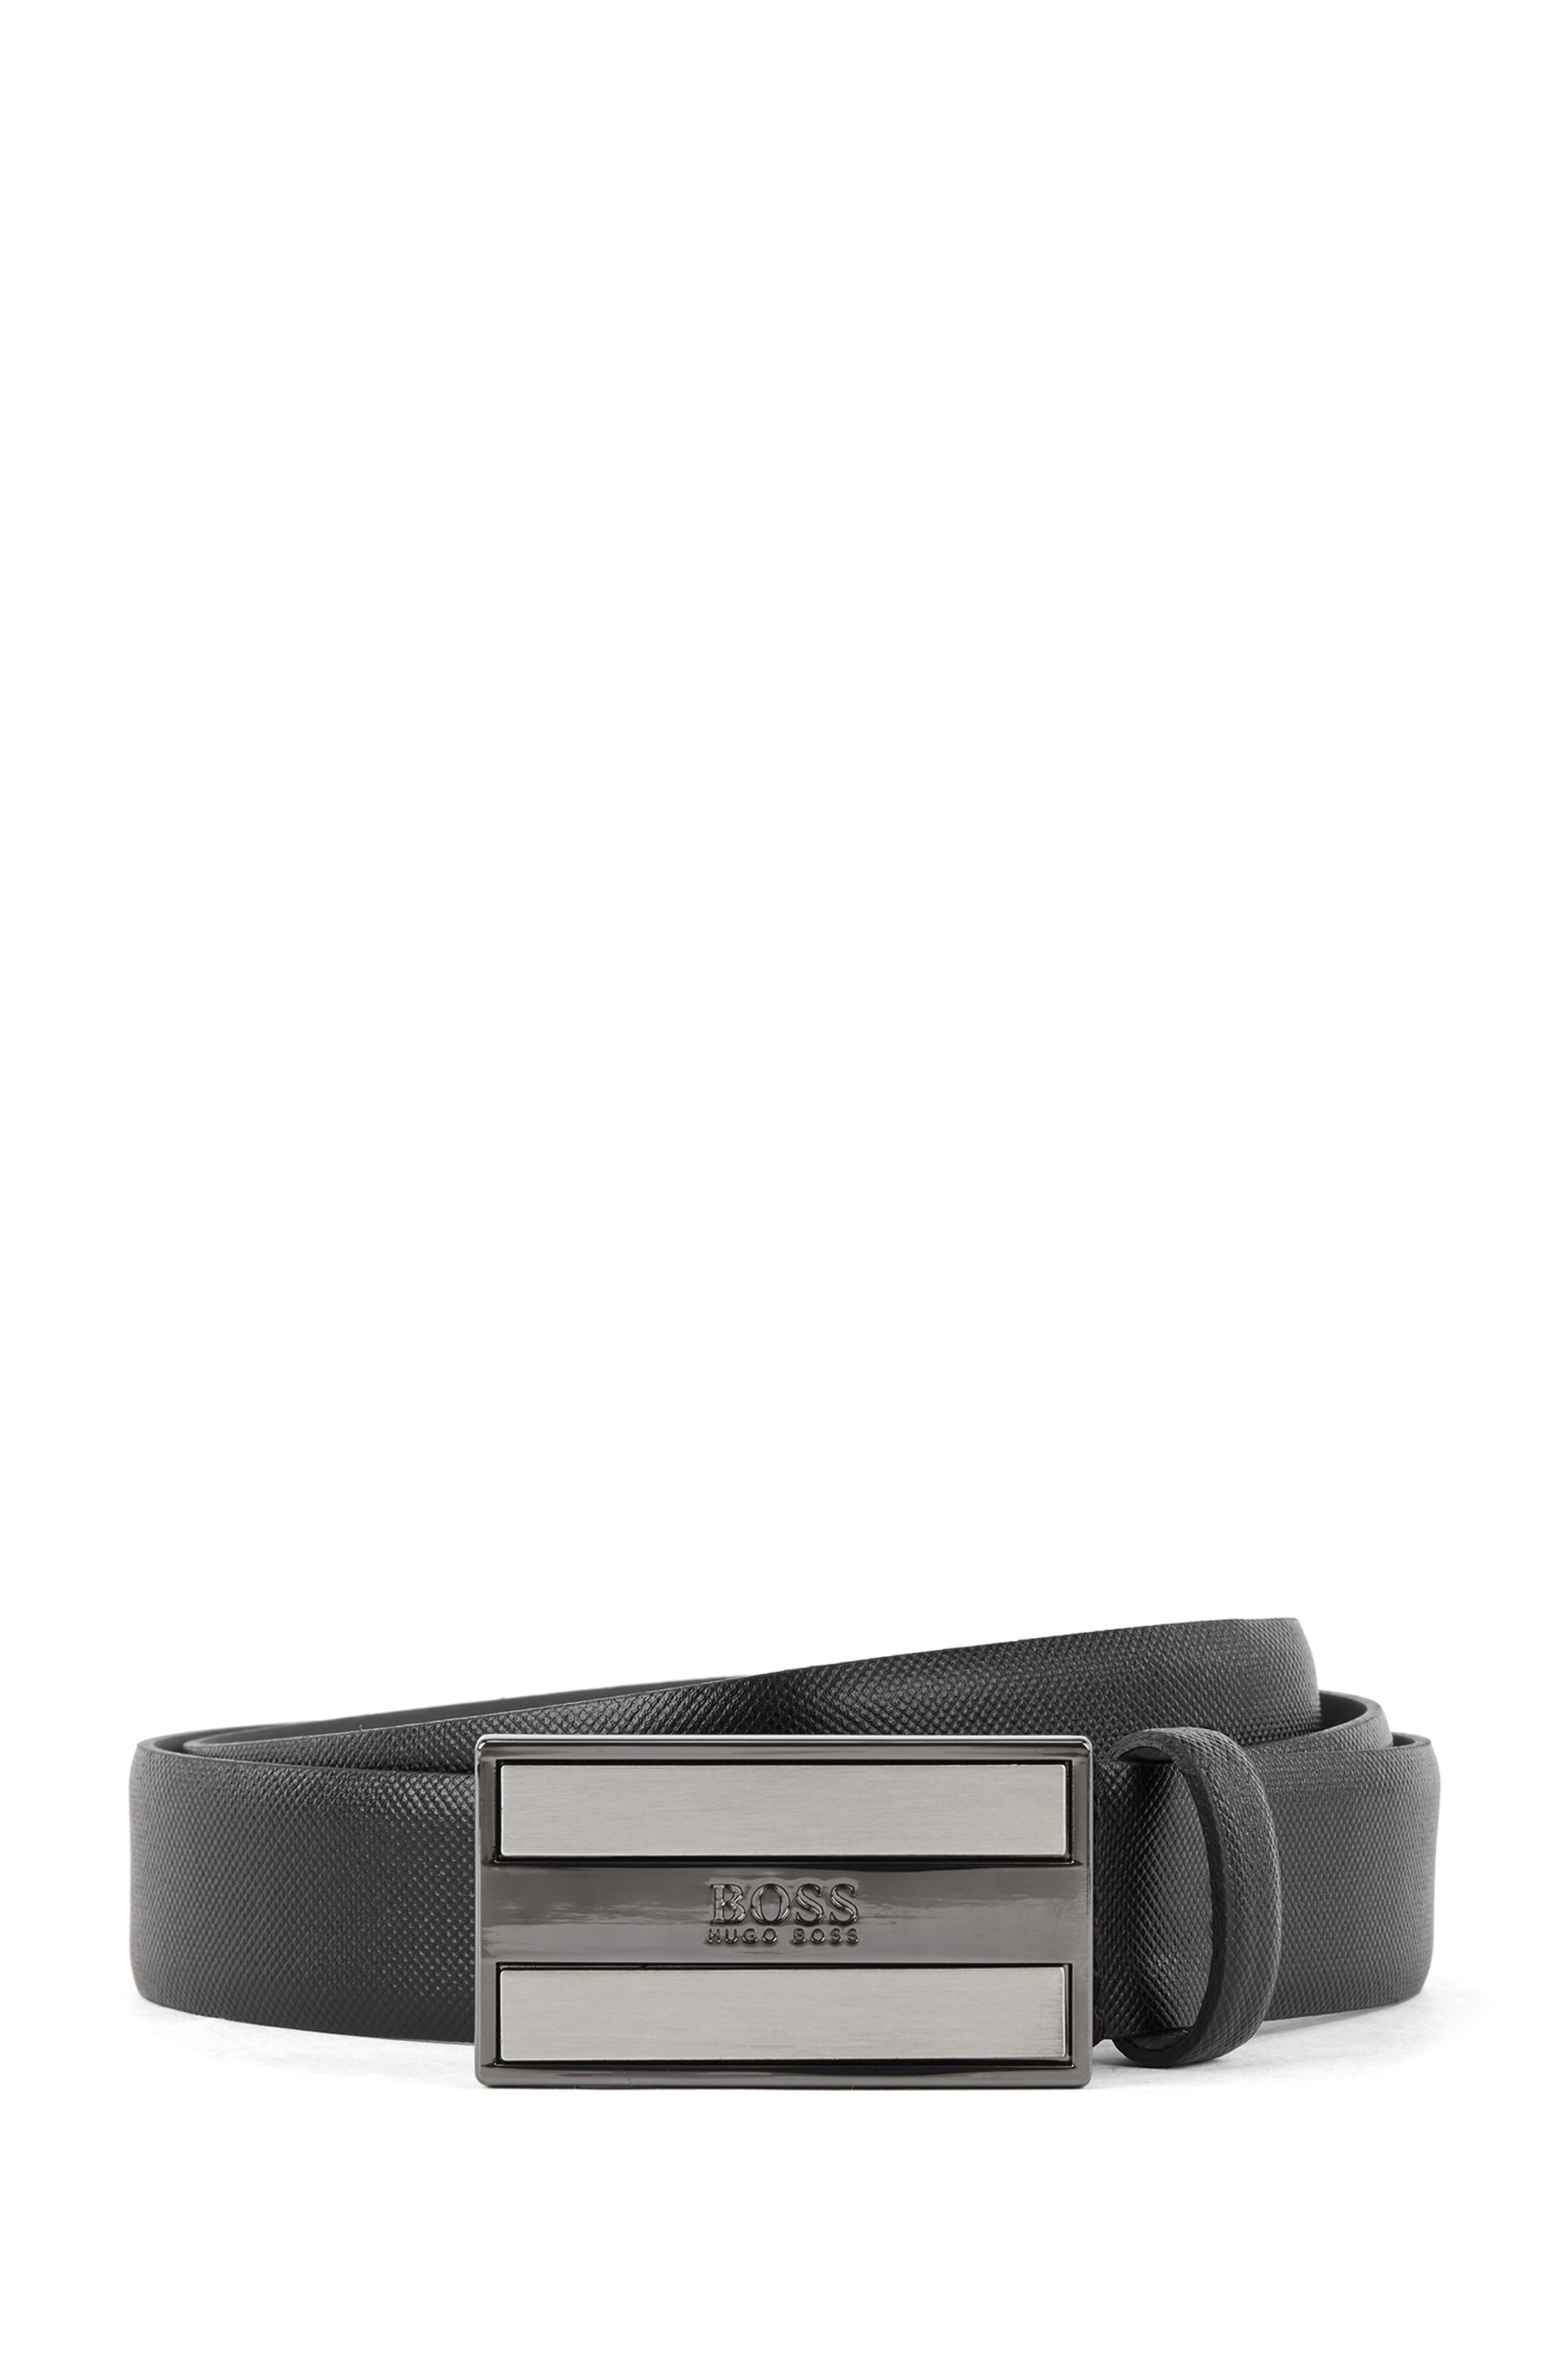 Printed-leather belt with signature plaque closure, Black